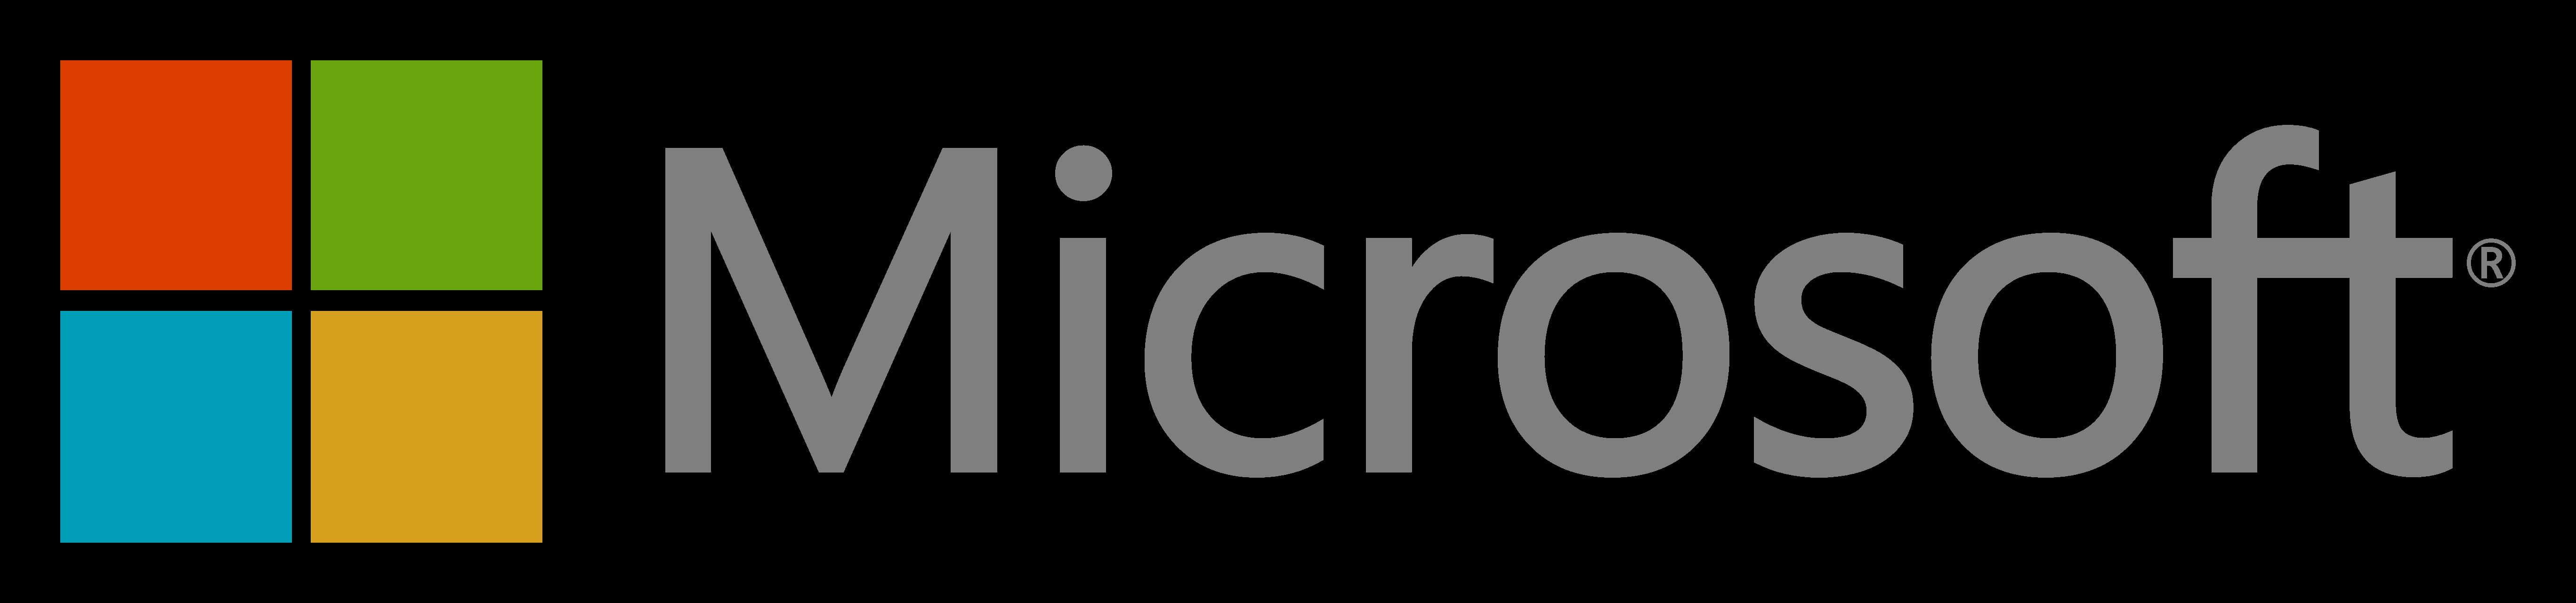 microsoft-logo-png-transparent-background-1